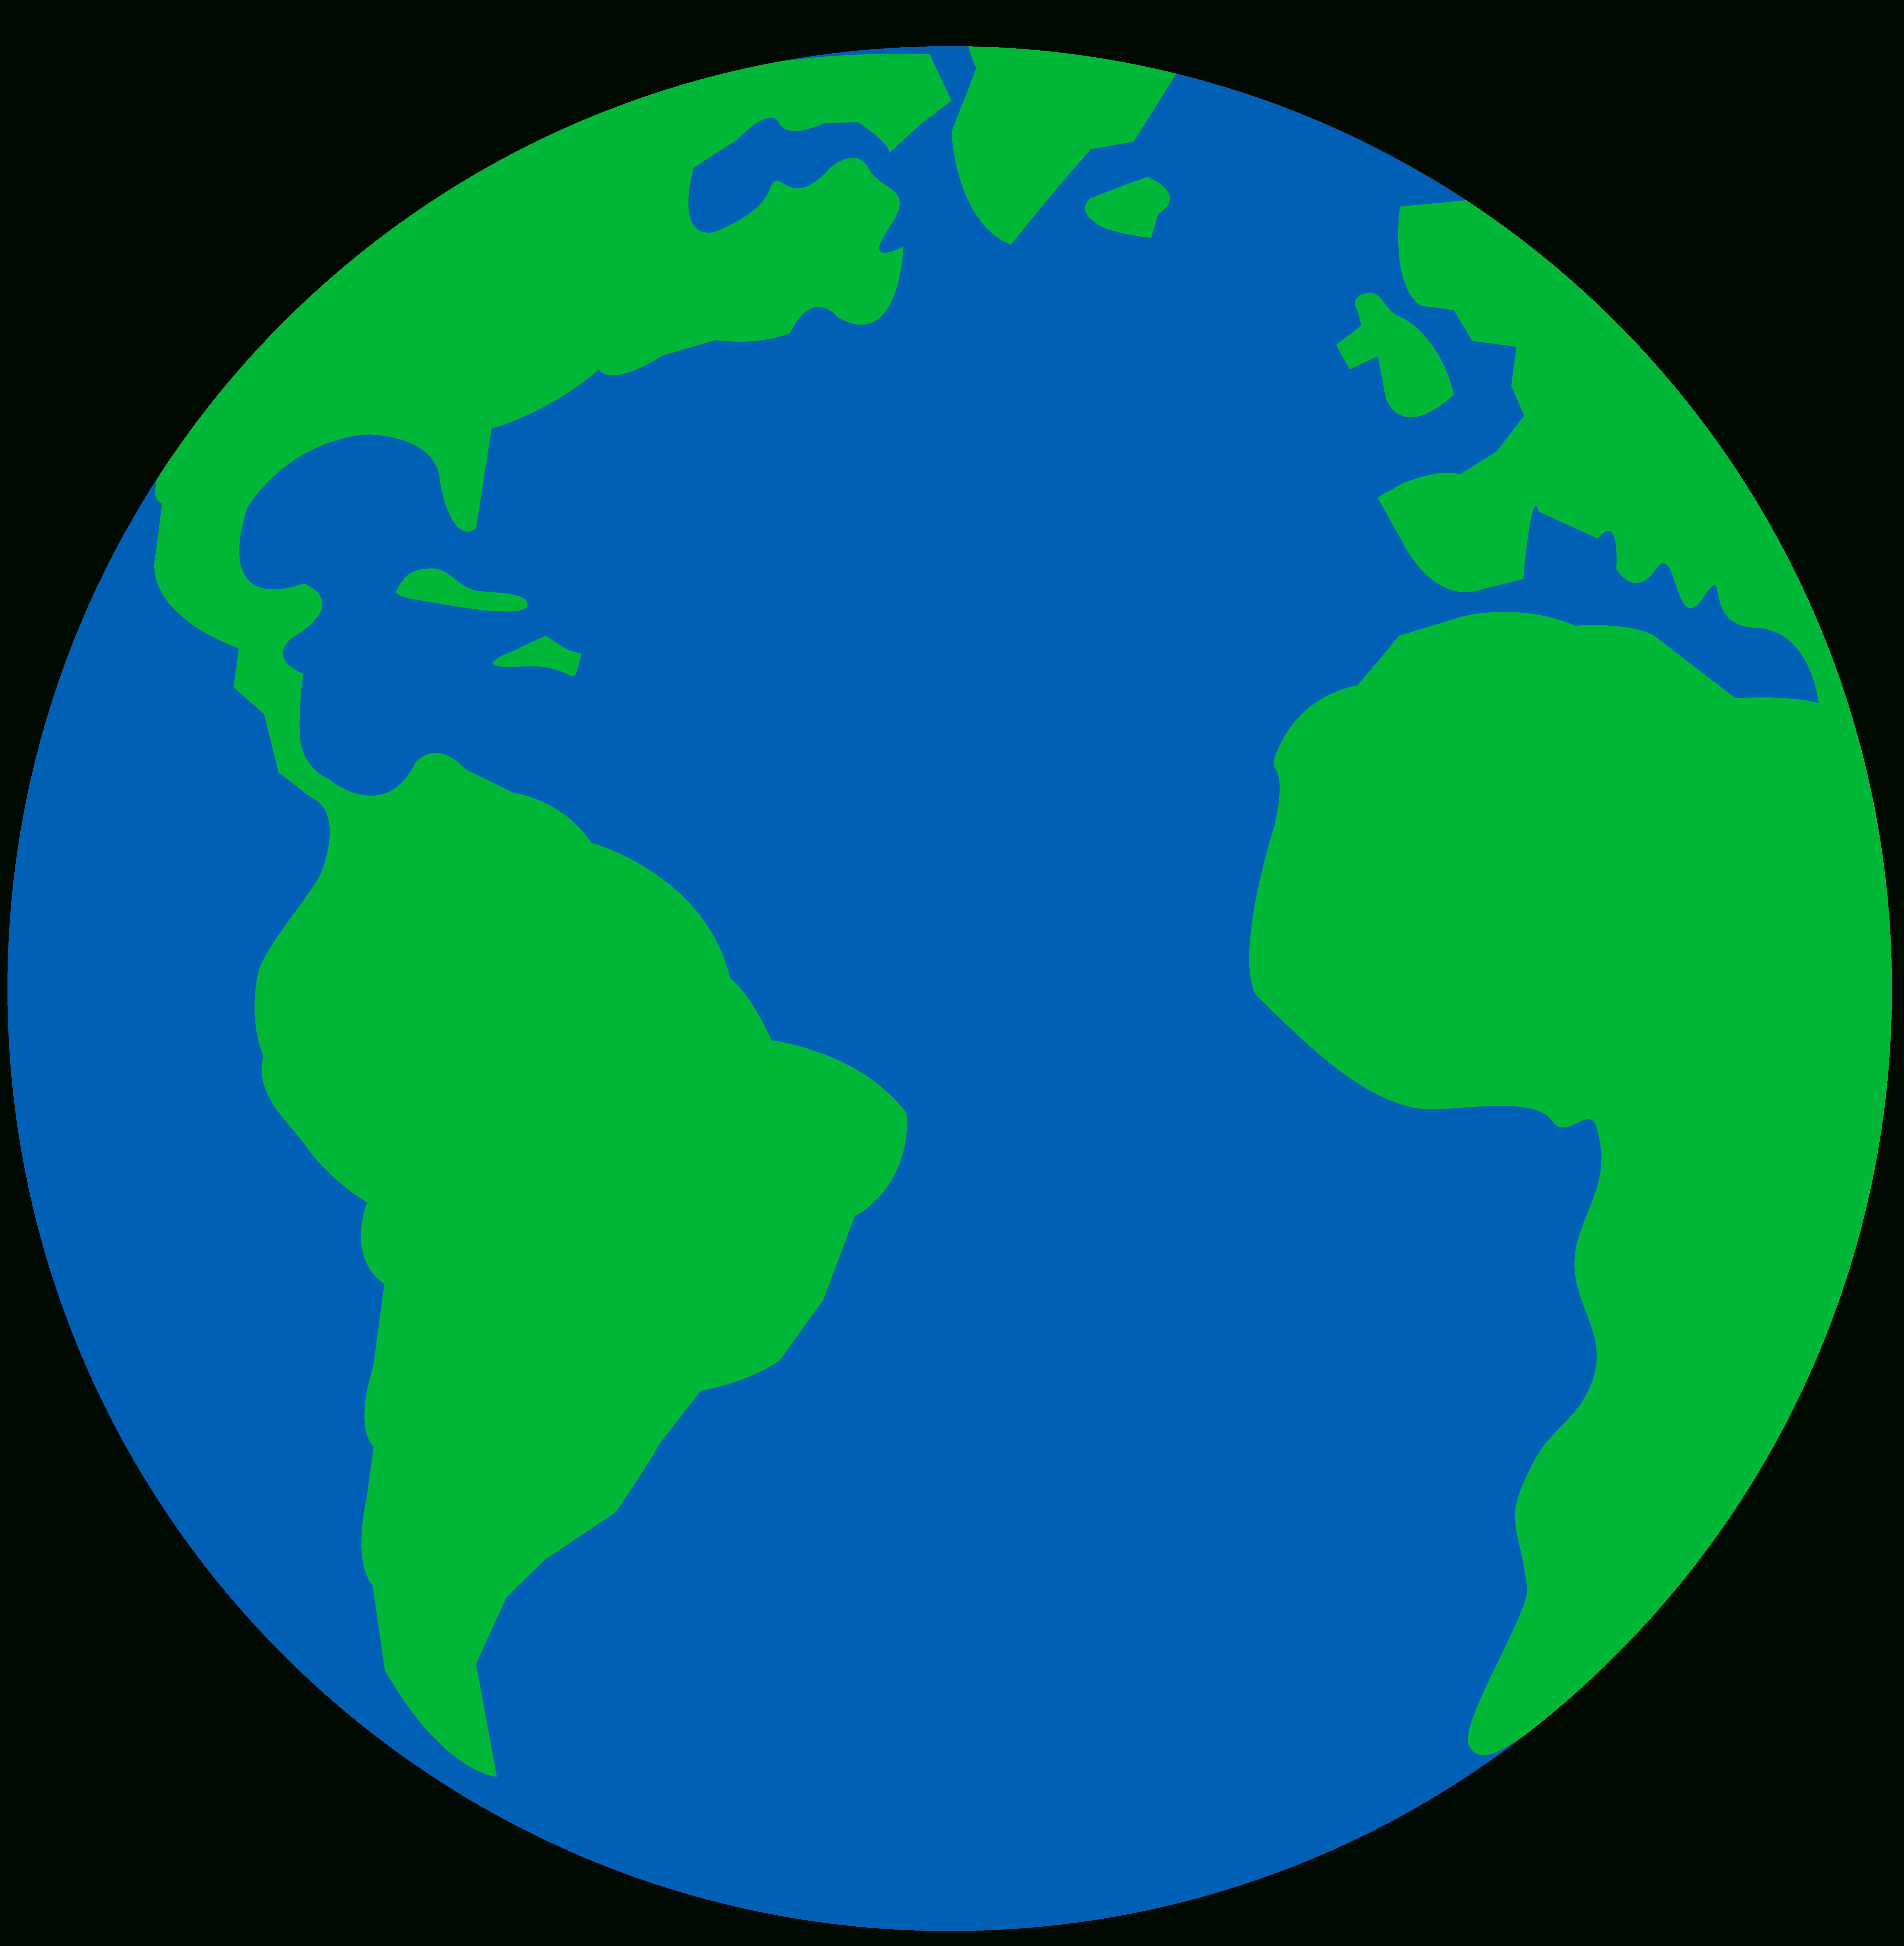 earth cartoon drawing at getdrawings com free for personal use rh getdrawings com save earth cartoon images earth science cartoon images